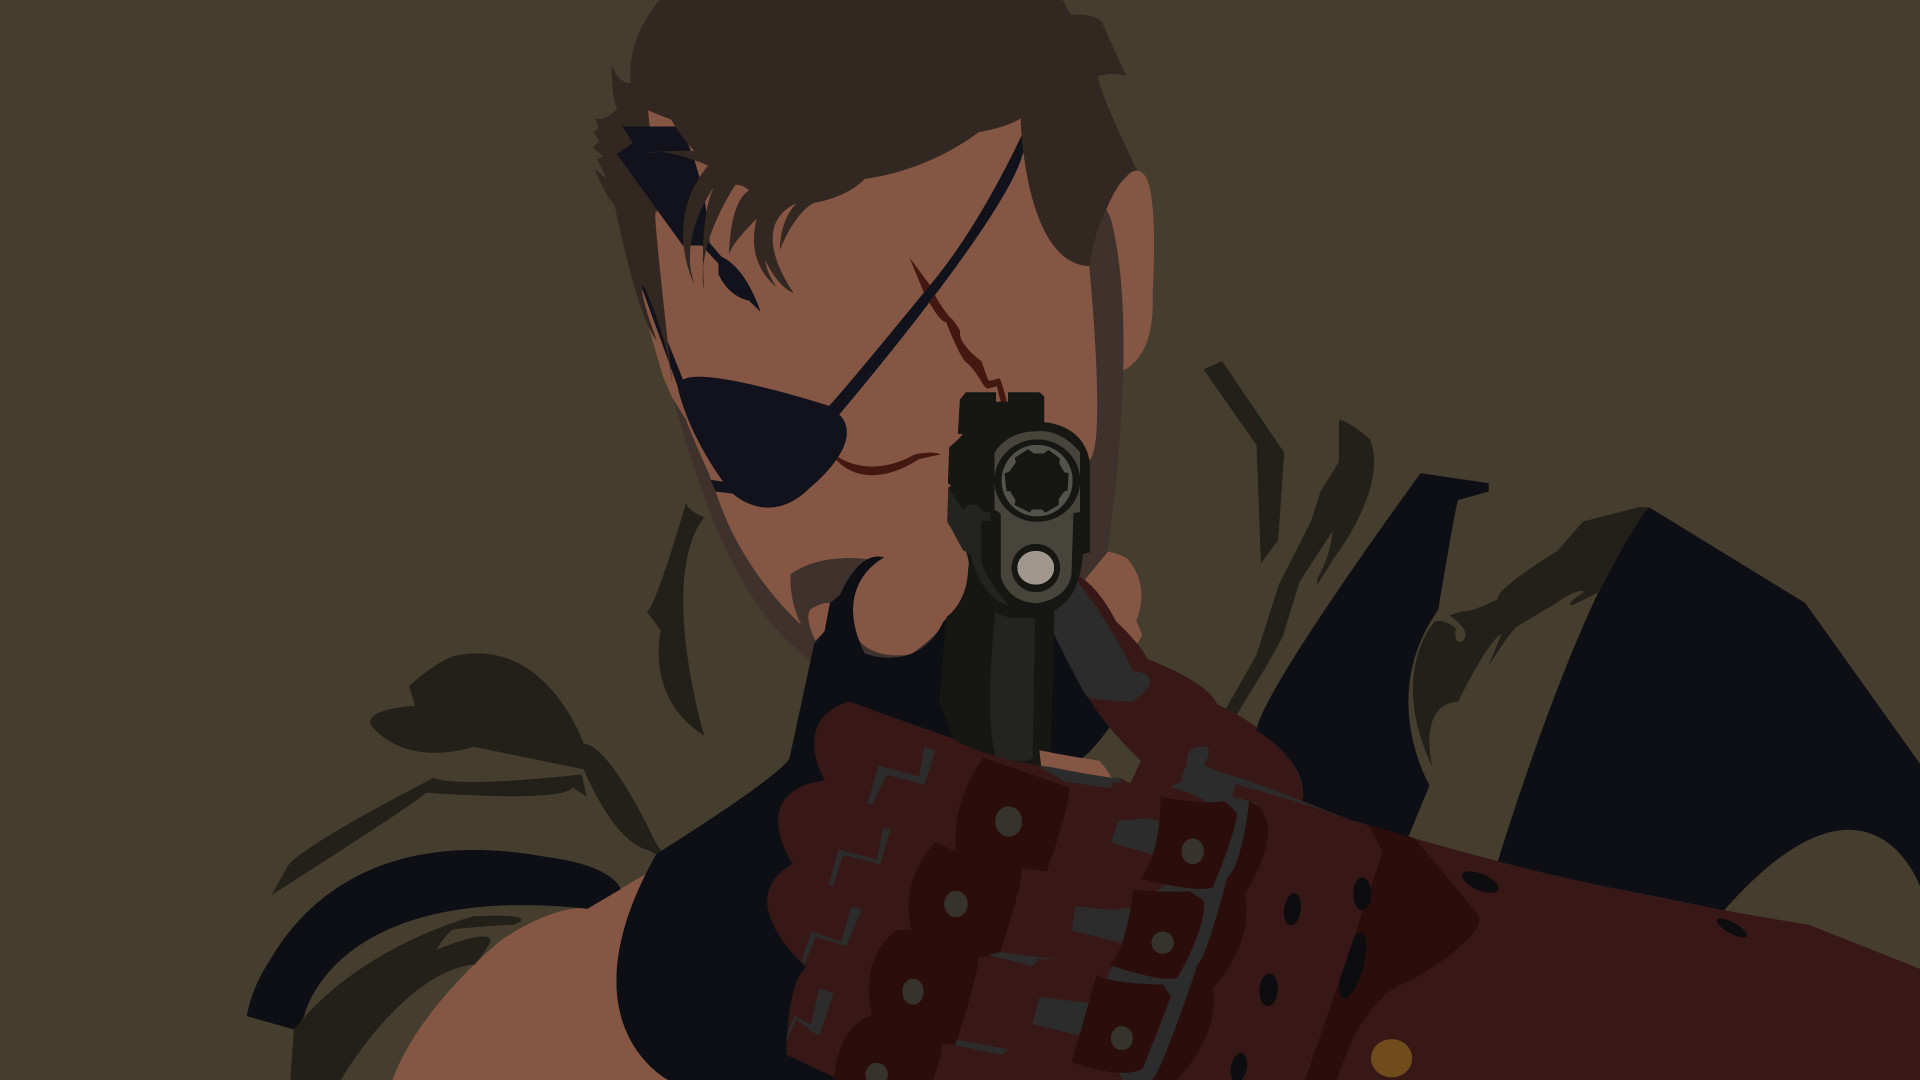 Metal Gear Solid V The Phantom Pain, Big Boss, minimalism, Metal Gear  Solid, vectors, Metal Gear – wallpaper #51180 (1920x1080px) on Wallls.com